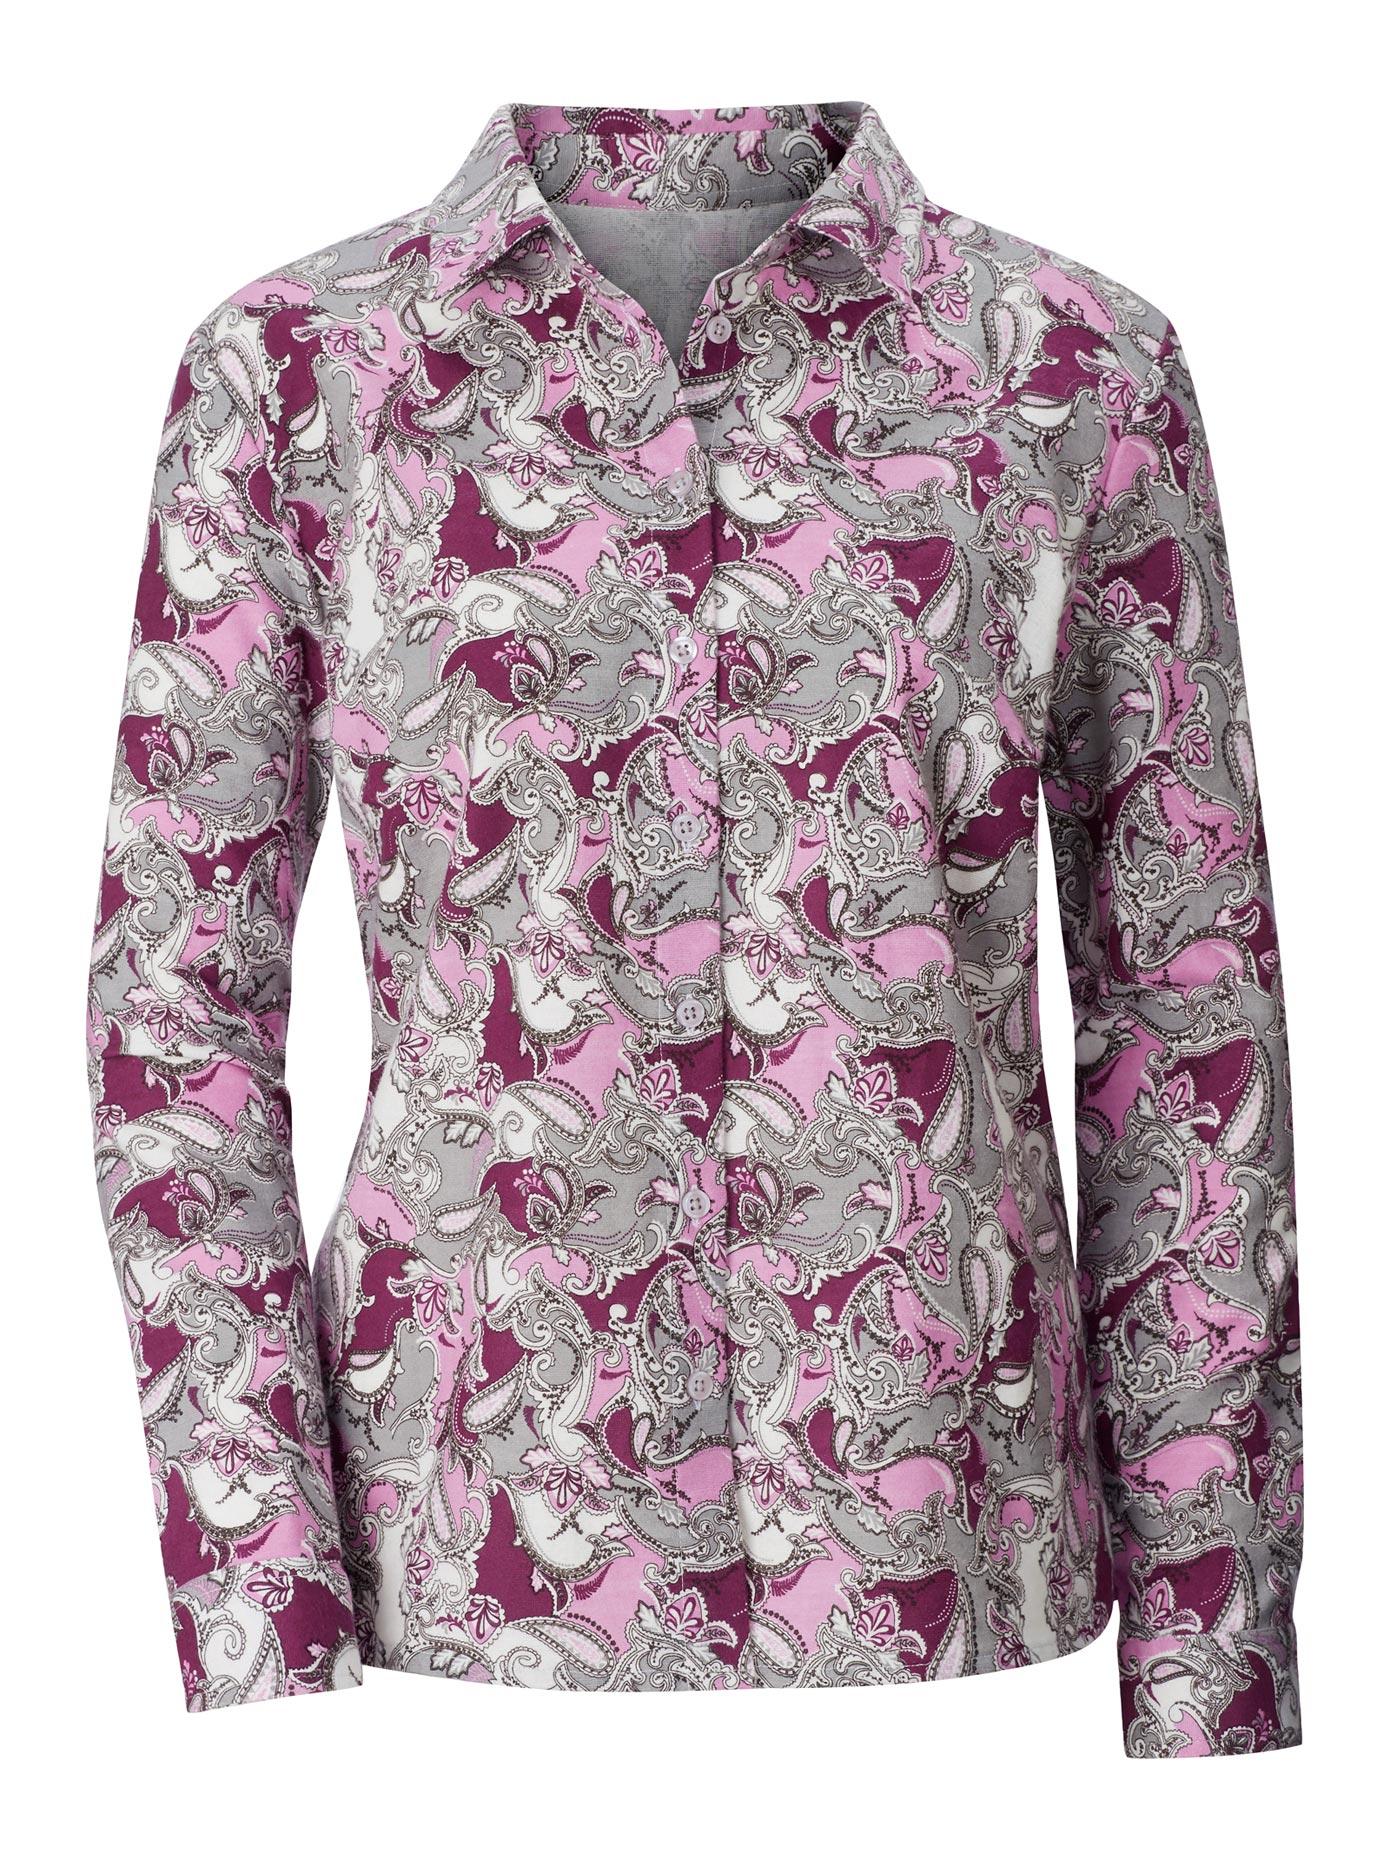 Classic Basics Bluse im ausdrucksstarkem Dessin